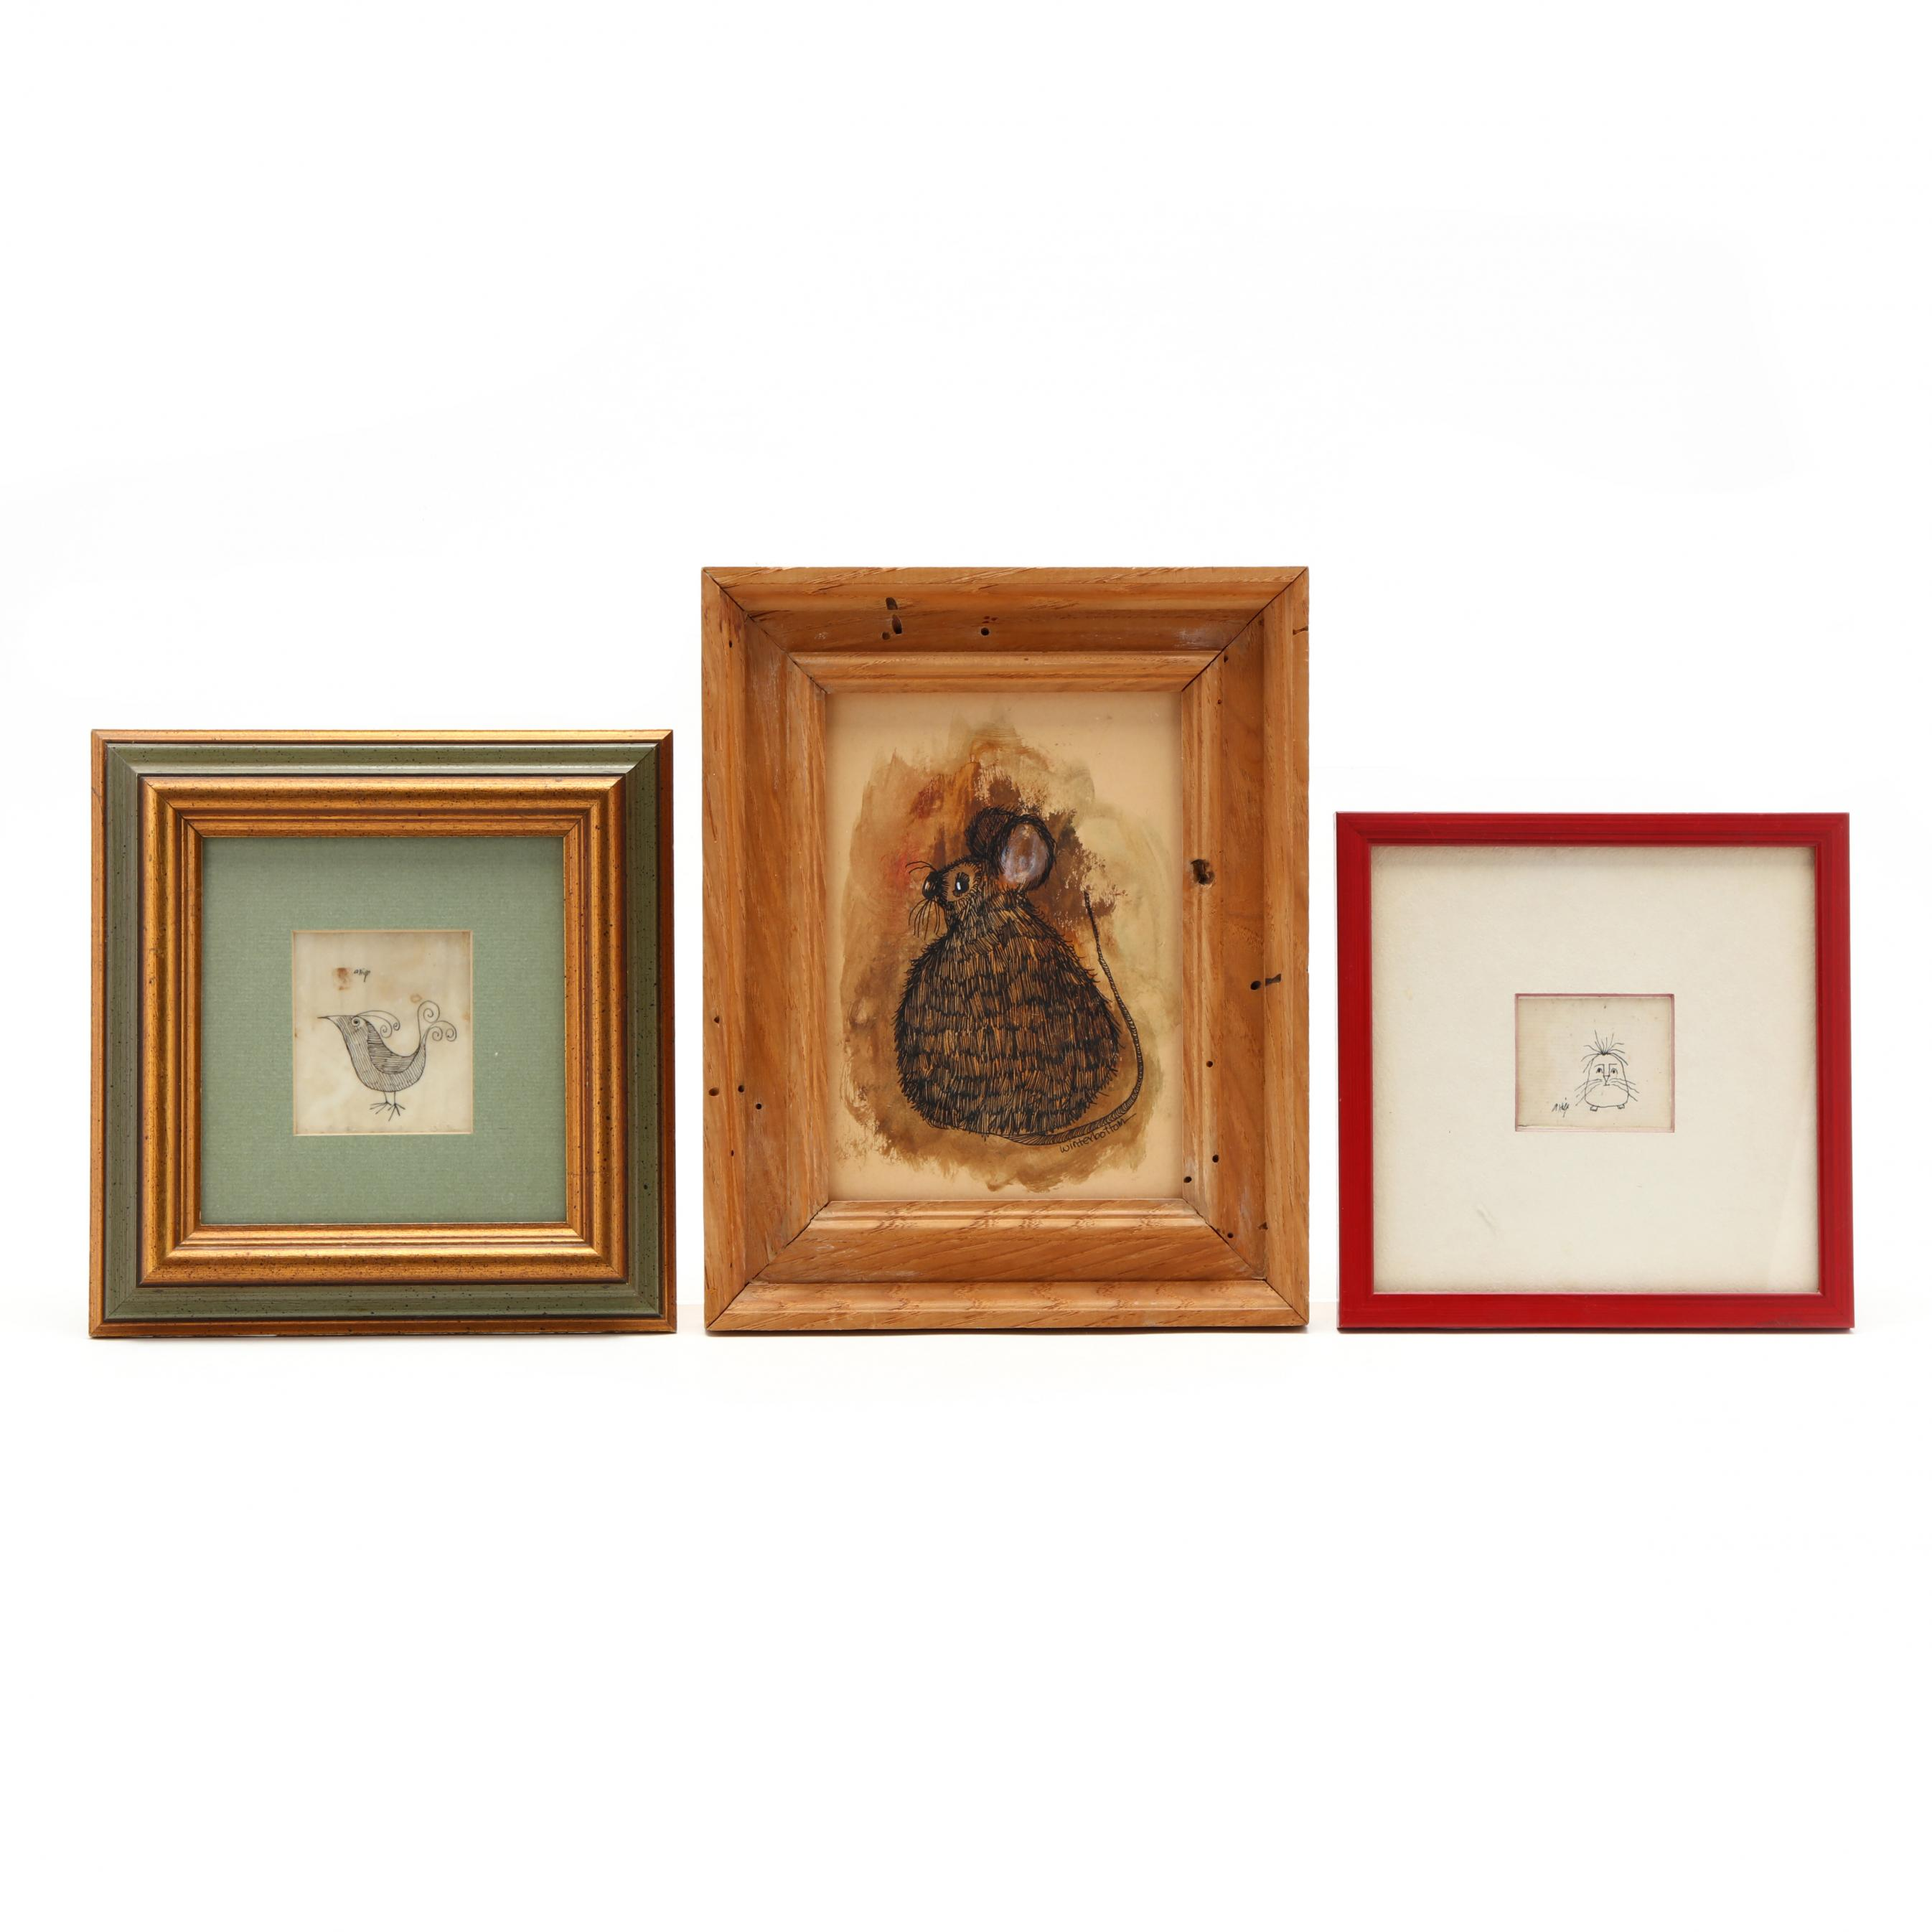 three-charming-mid-century-modern-sketches-of-animals